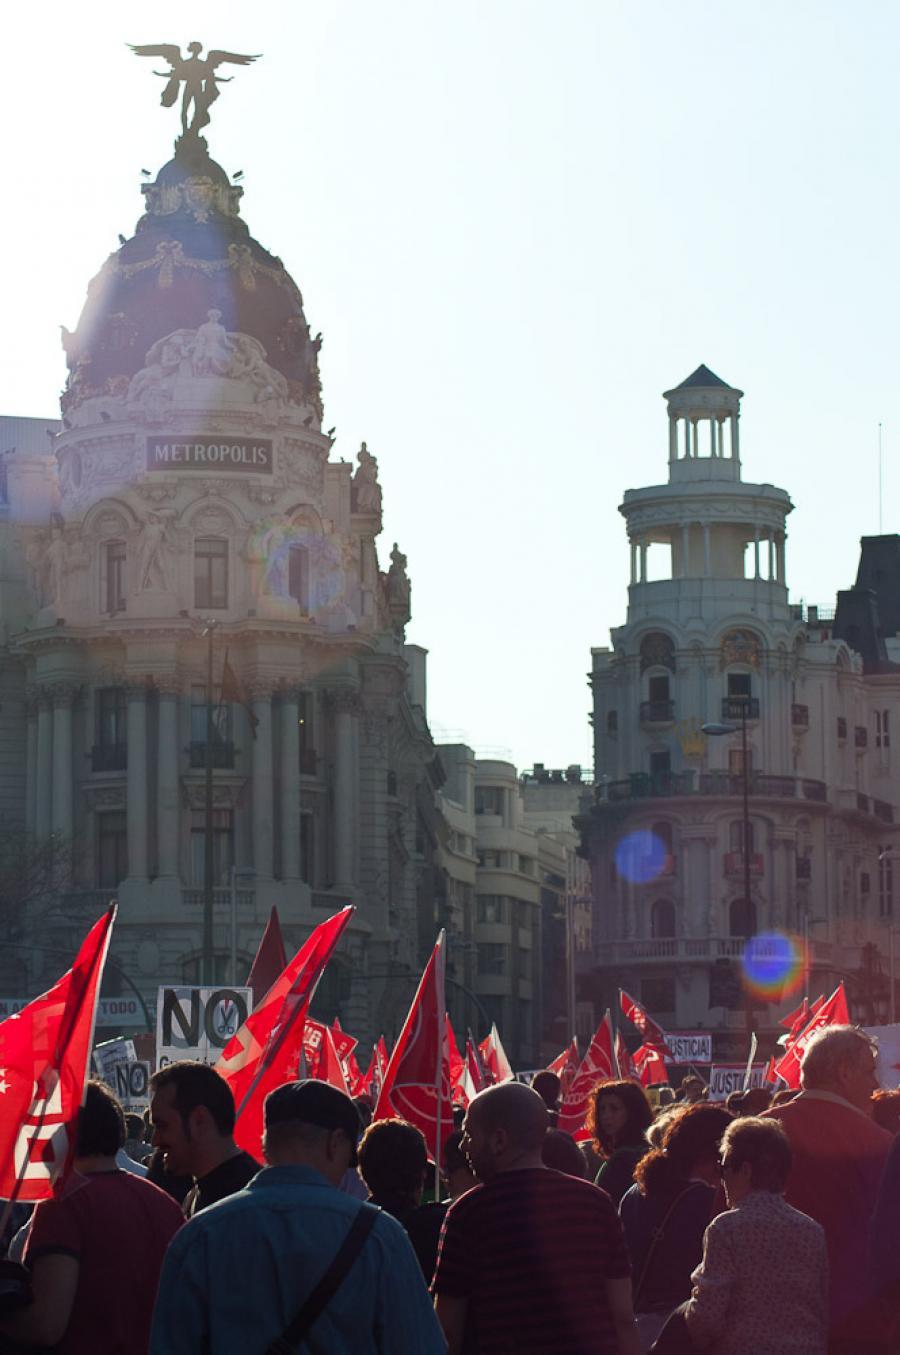 Huelga! Strikes in Madrid